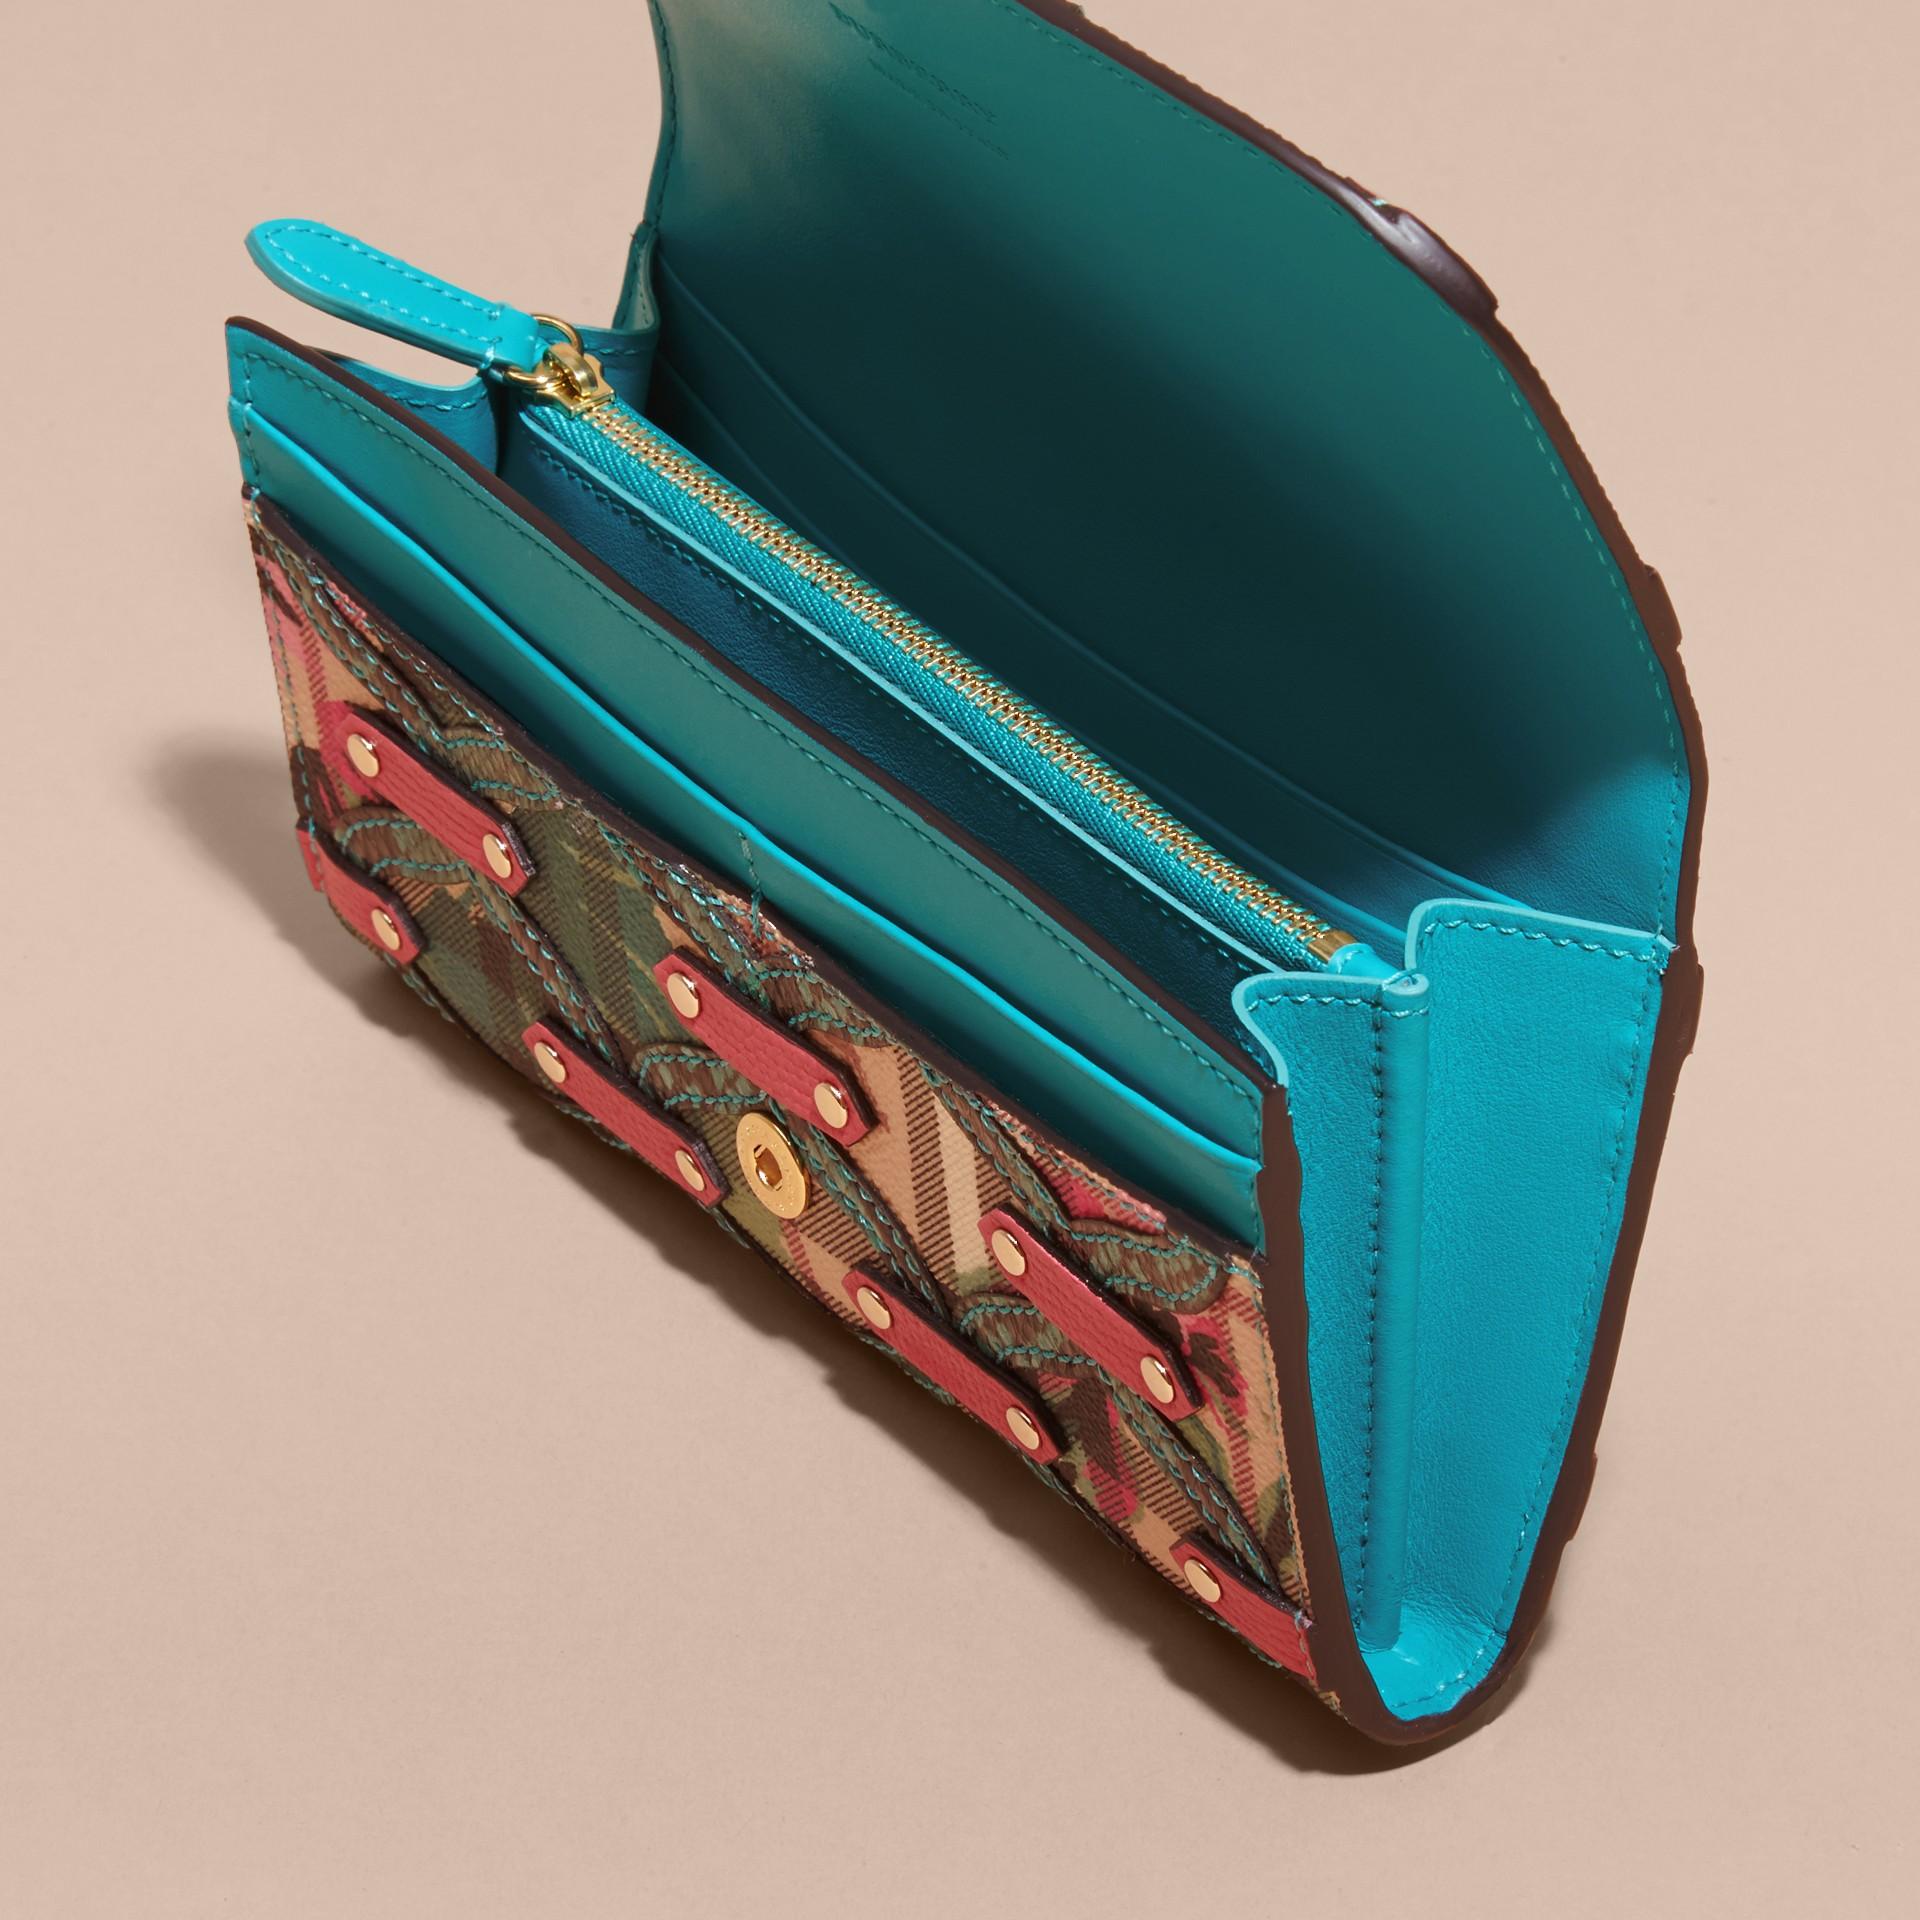 Snakeskin Appliqué Peony Rose Print Haymarket Check Continental Wallet in Plum Pink - gallery image 5